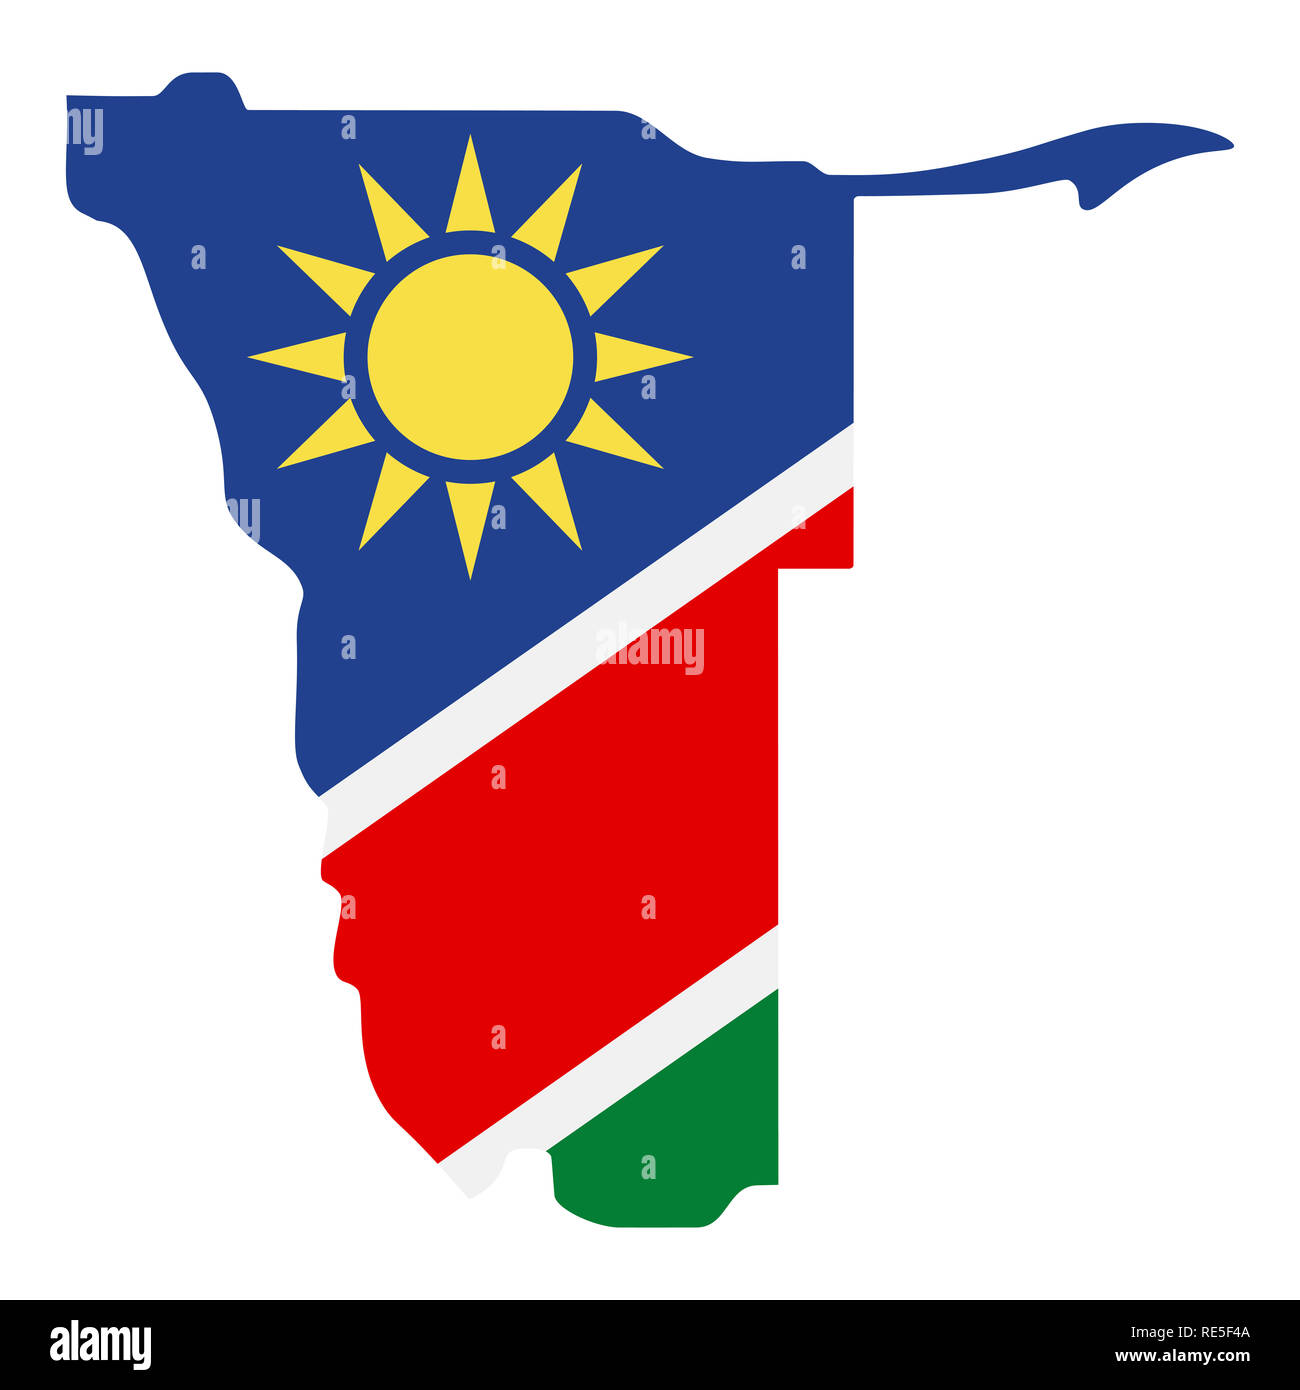 map of Namibia with flag inside. Namibia map  illustration - Stock Image